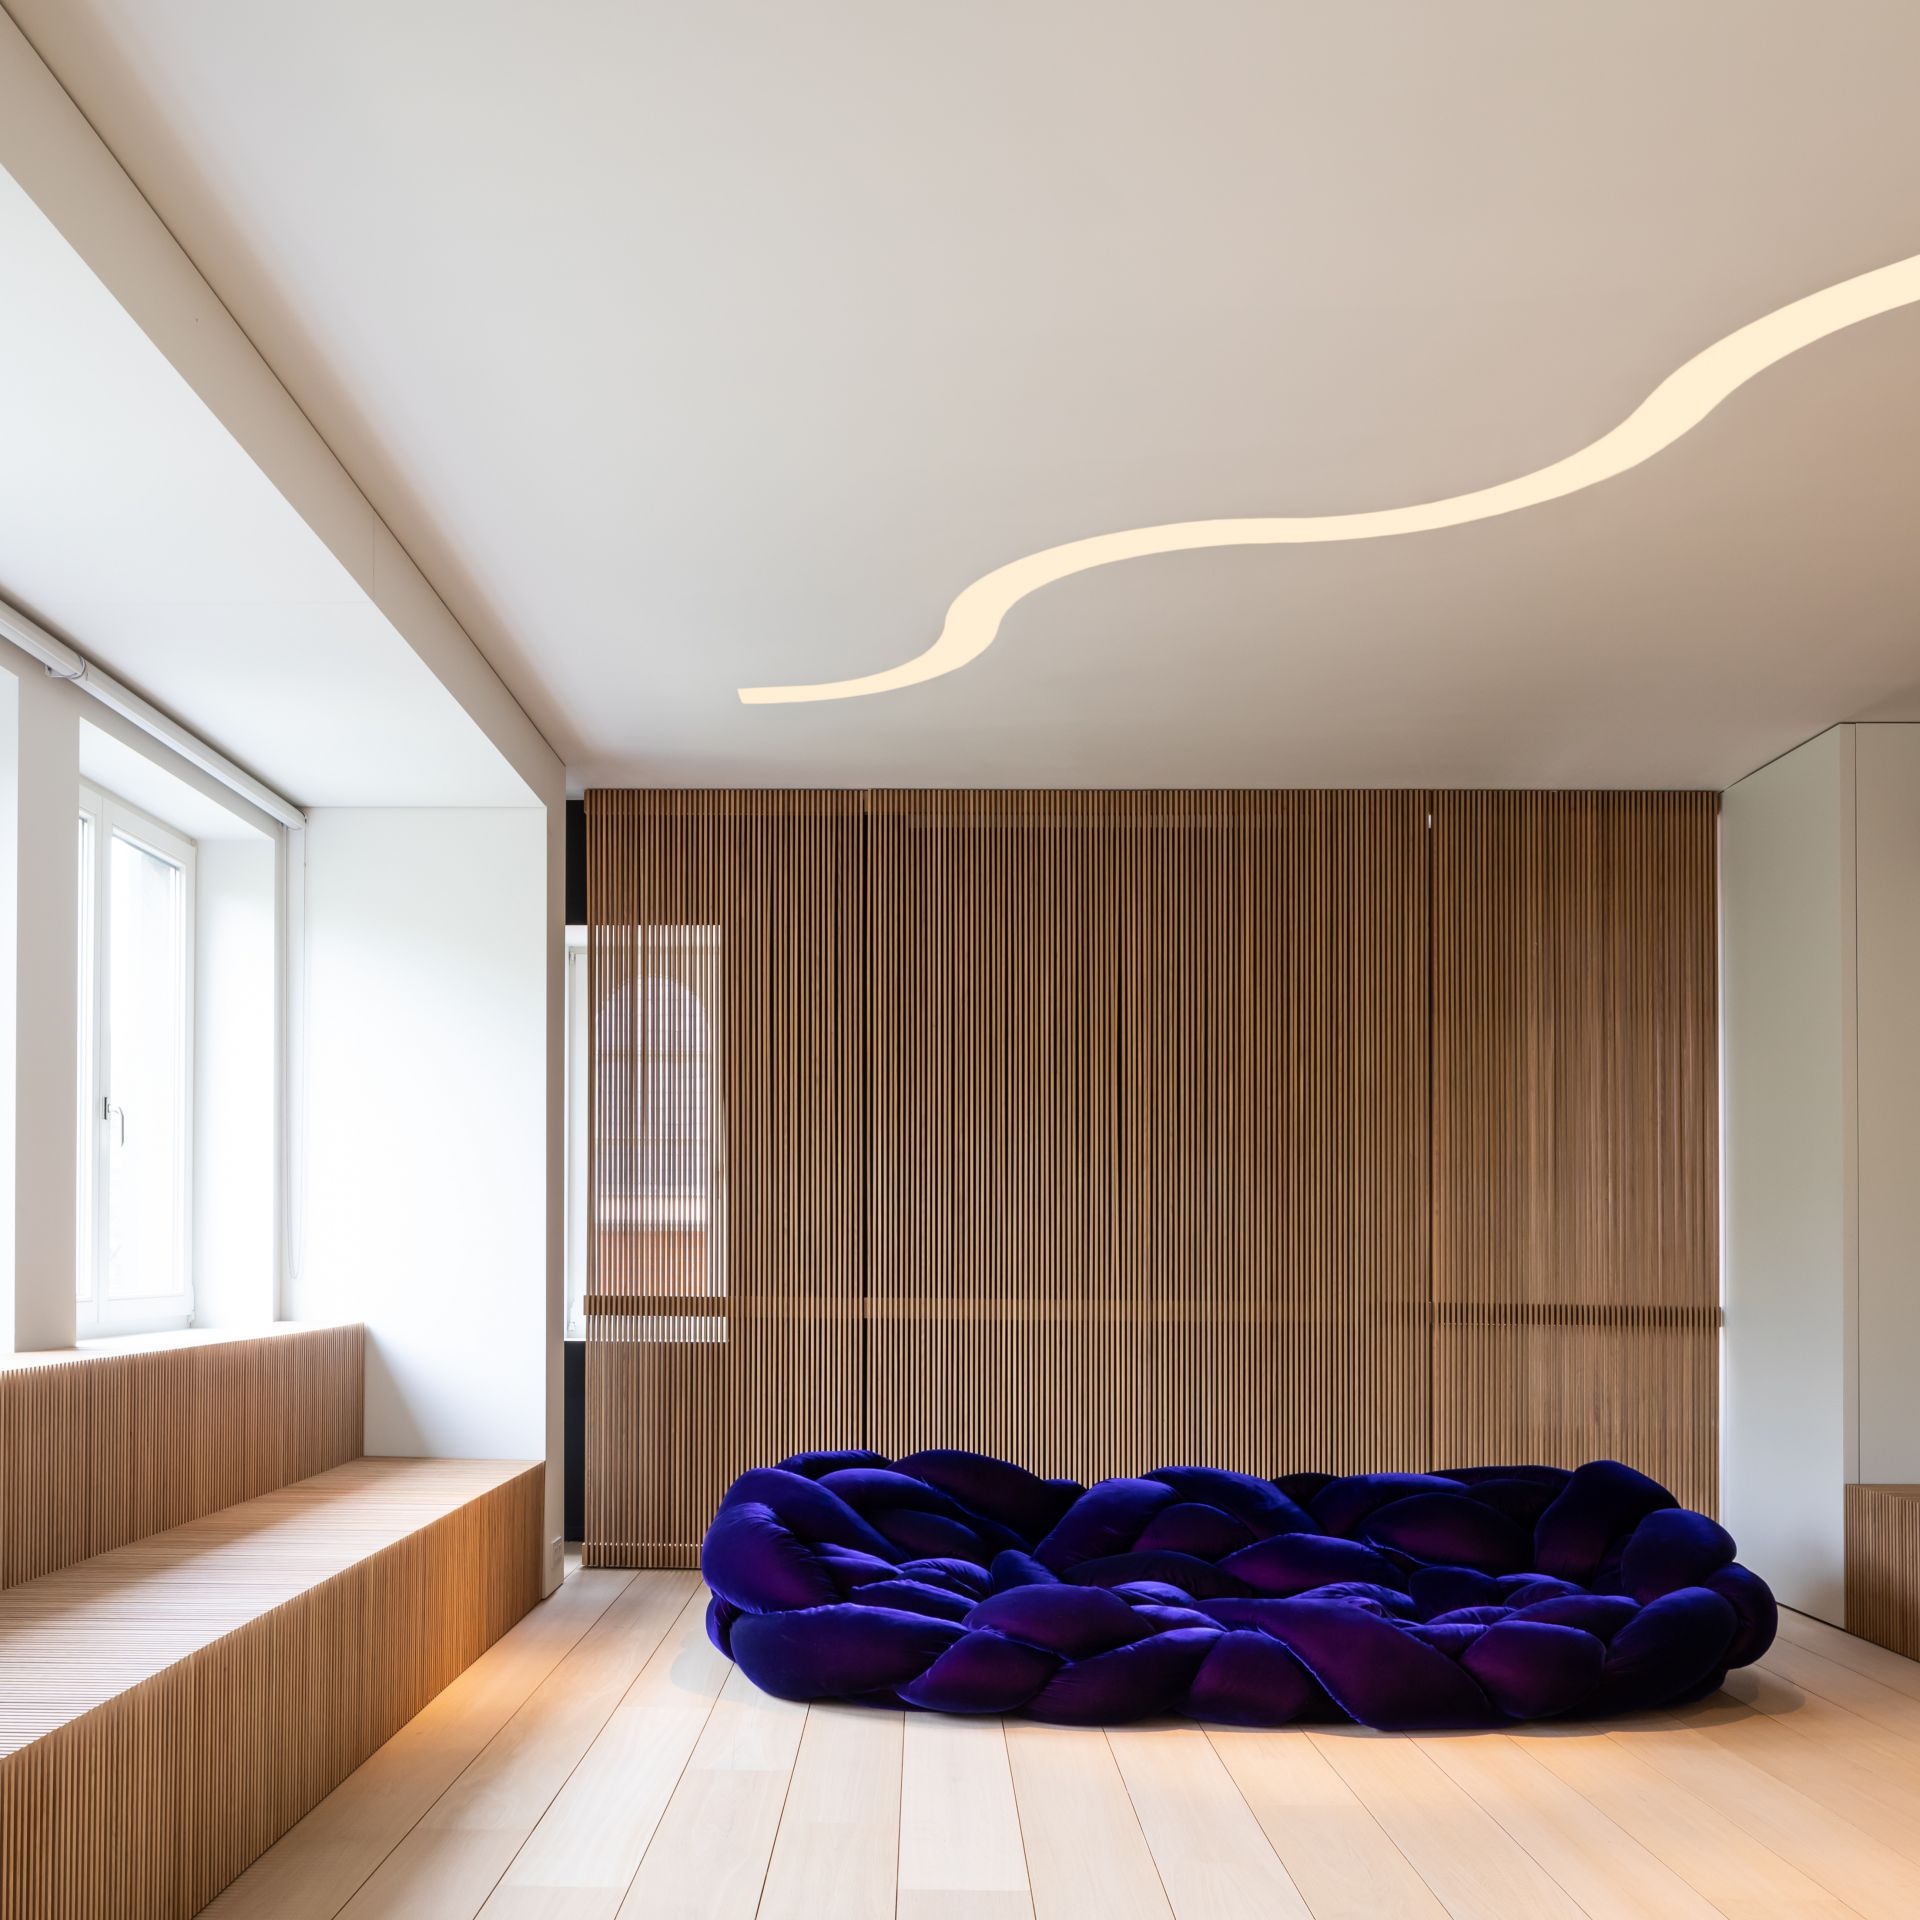 Appartamento ad Anversa - image 11